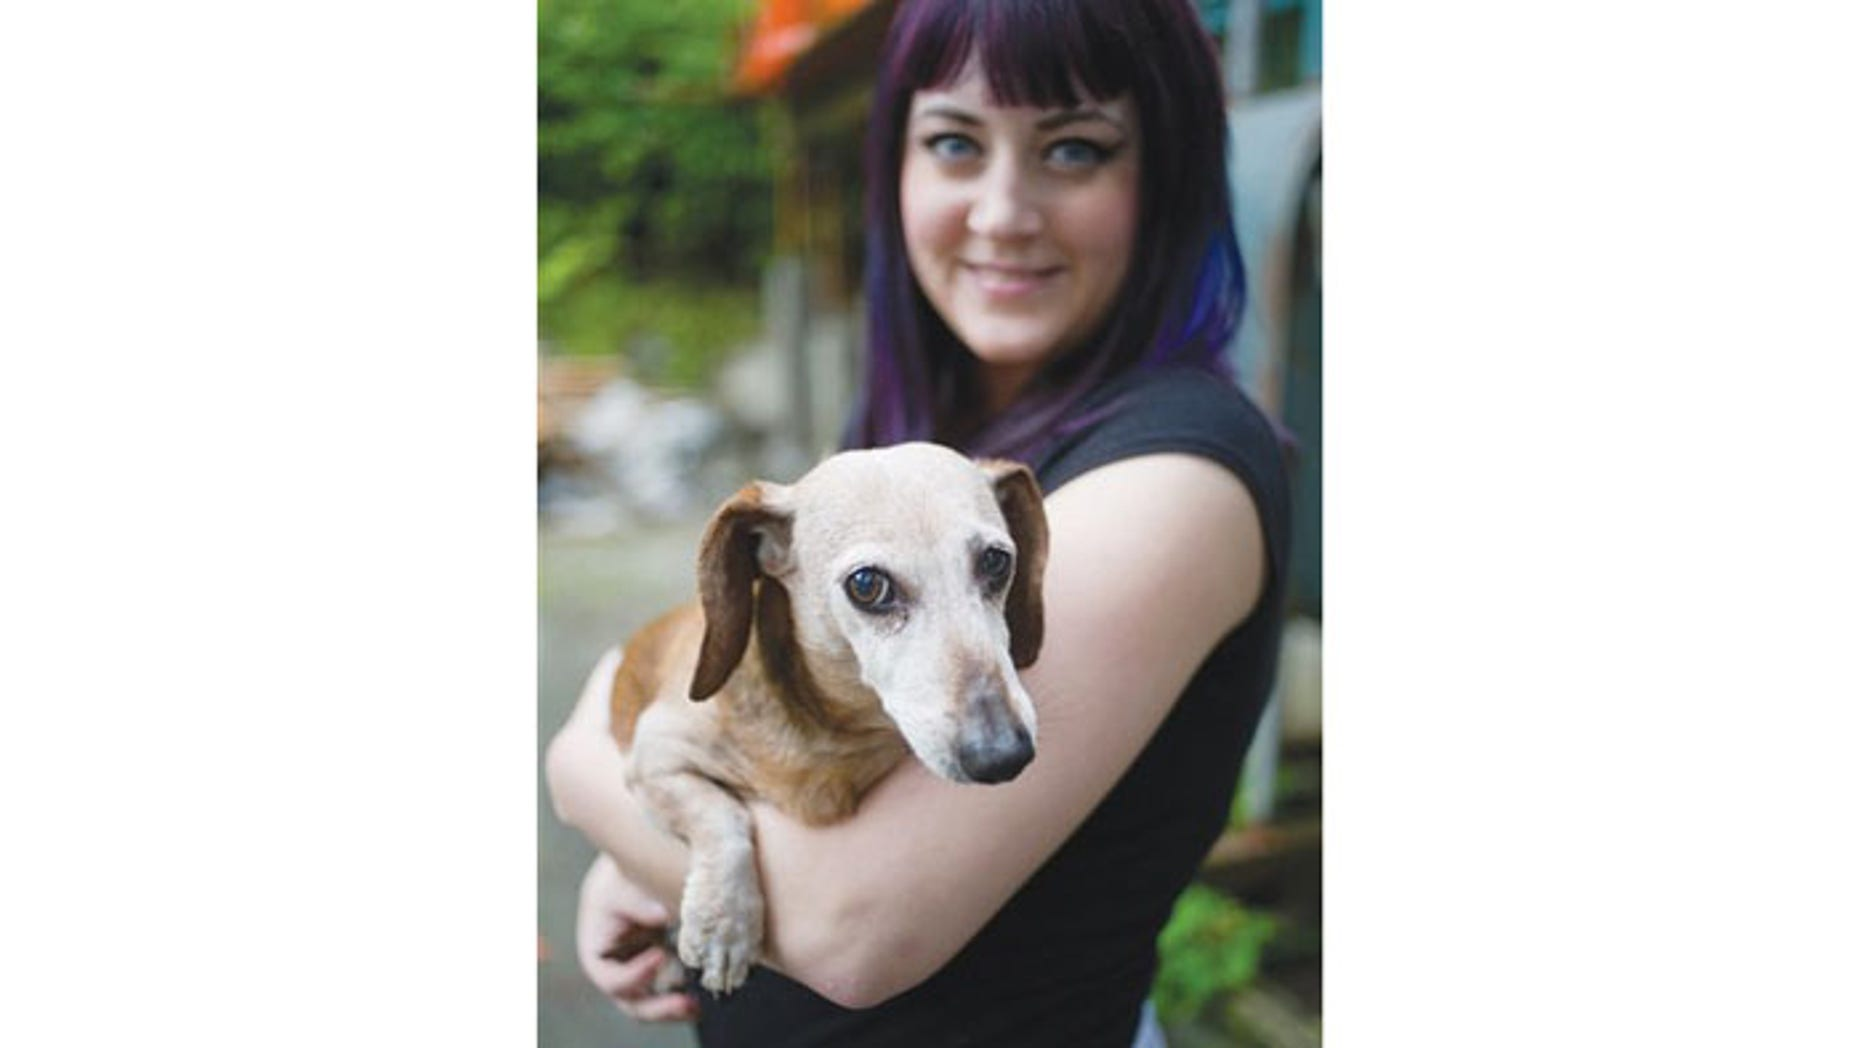 August 30: Brook Collins holds her dog, Fudge, at her home in Juneau, Alaska.